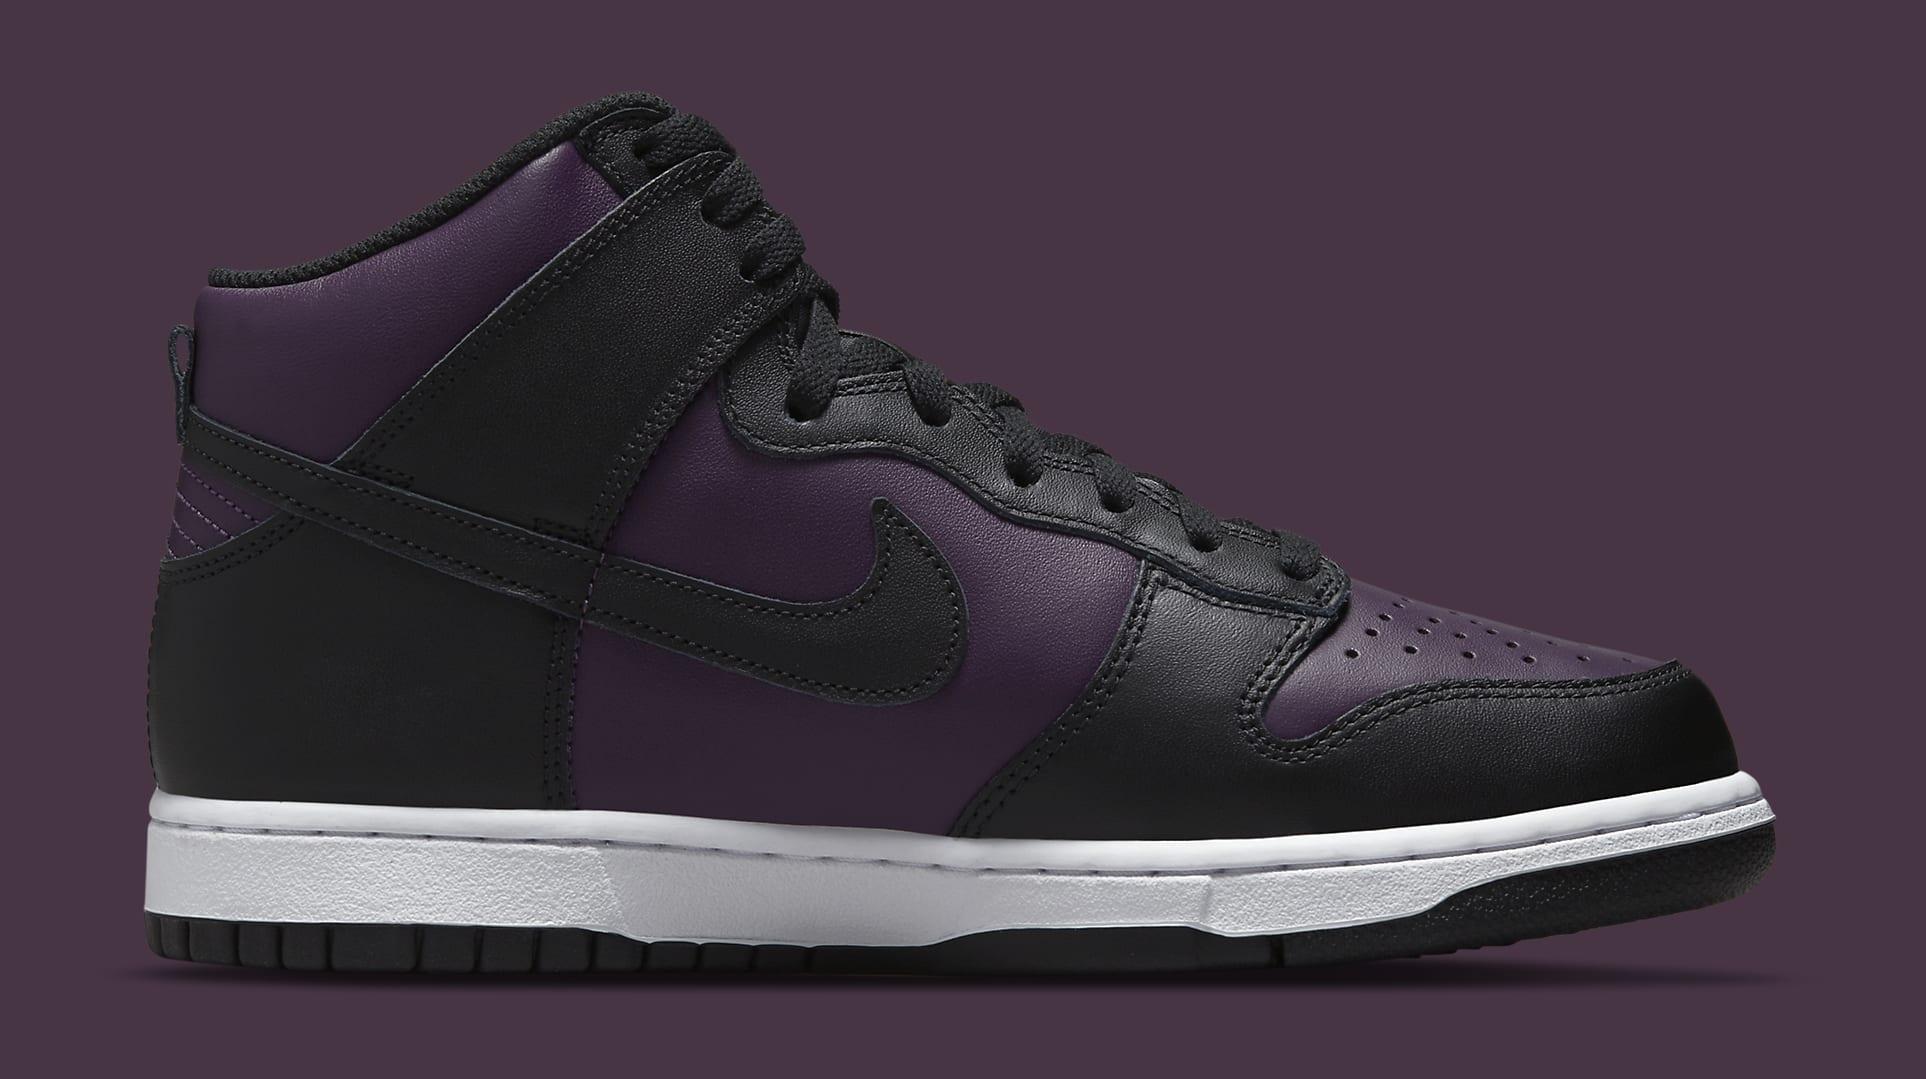 Fragment Design x Nike Dunk High 'Black' DJ0382-600 Medial